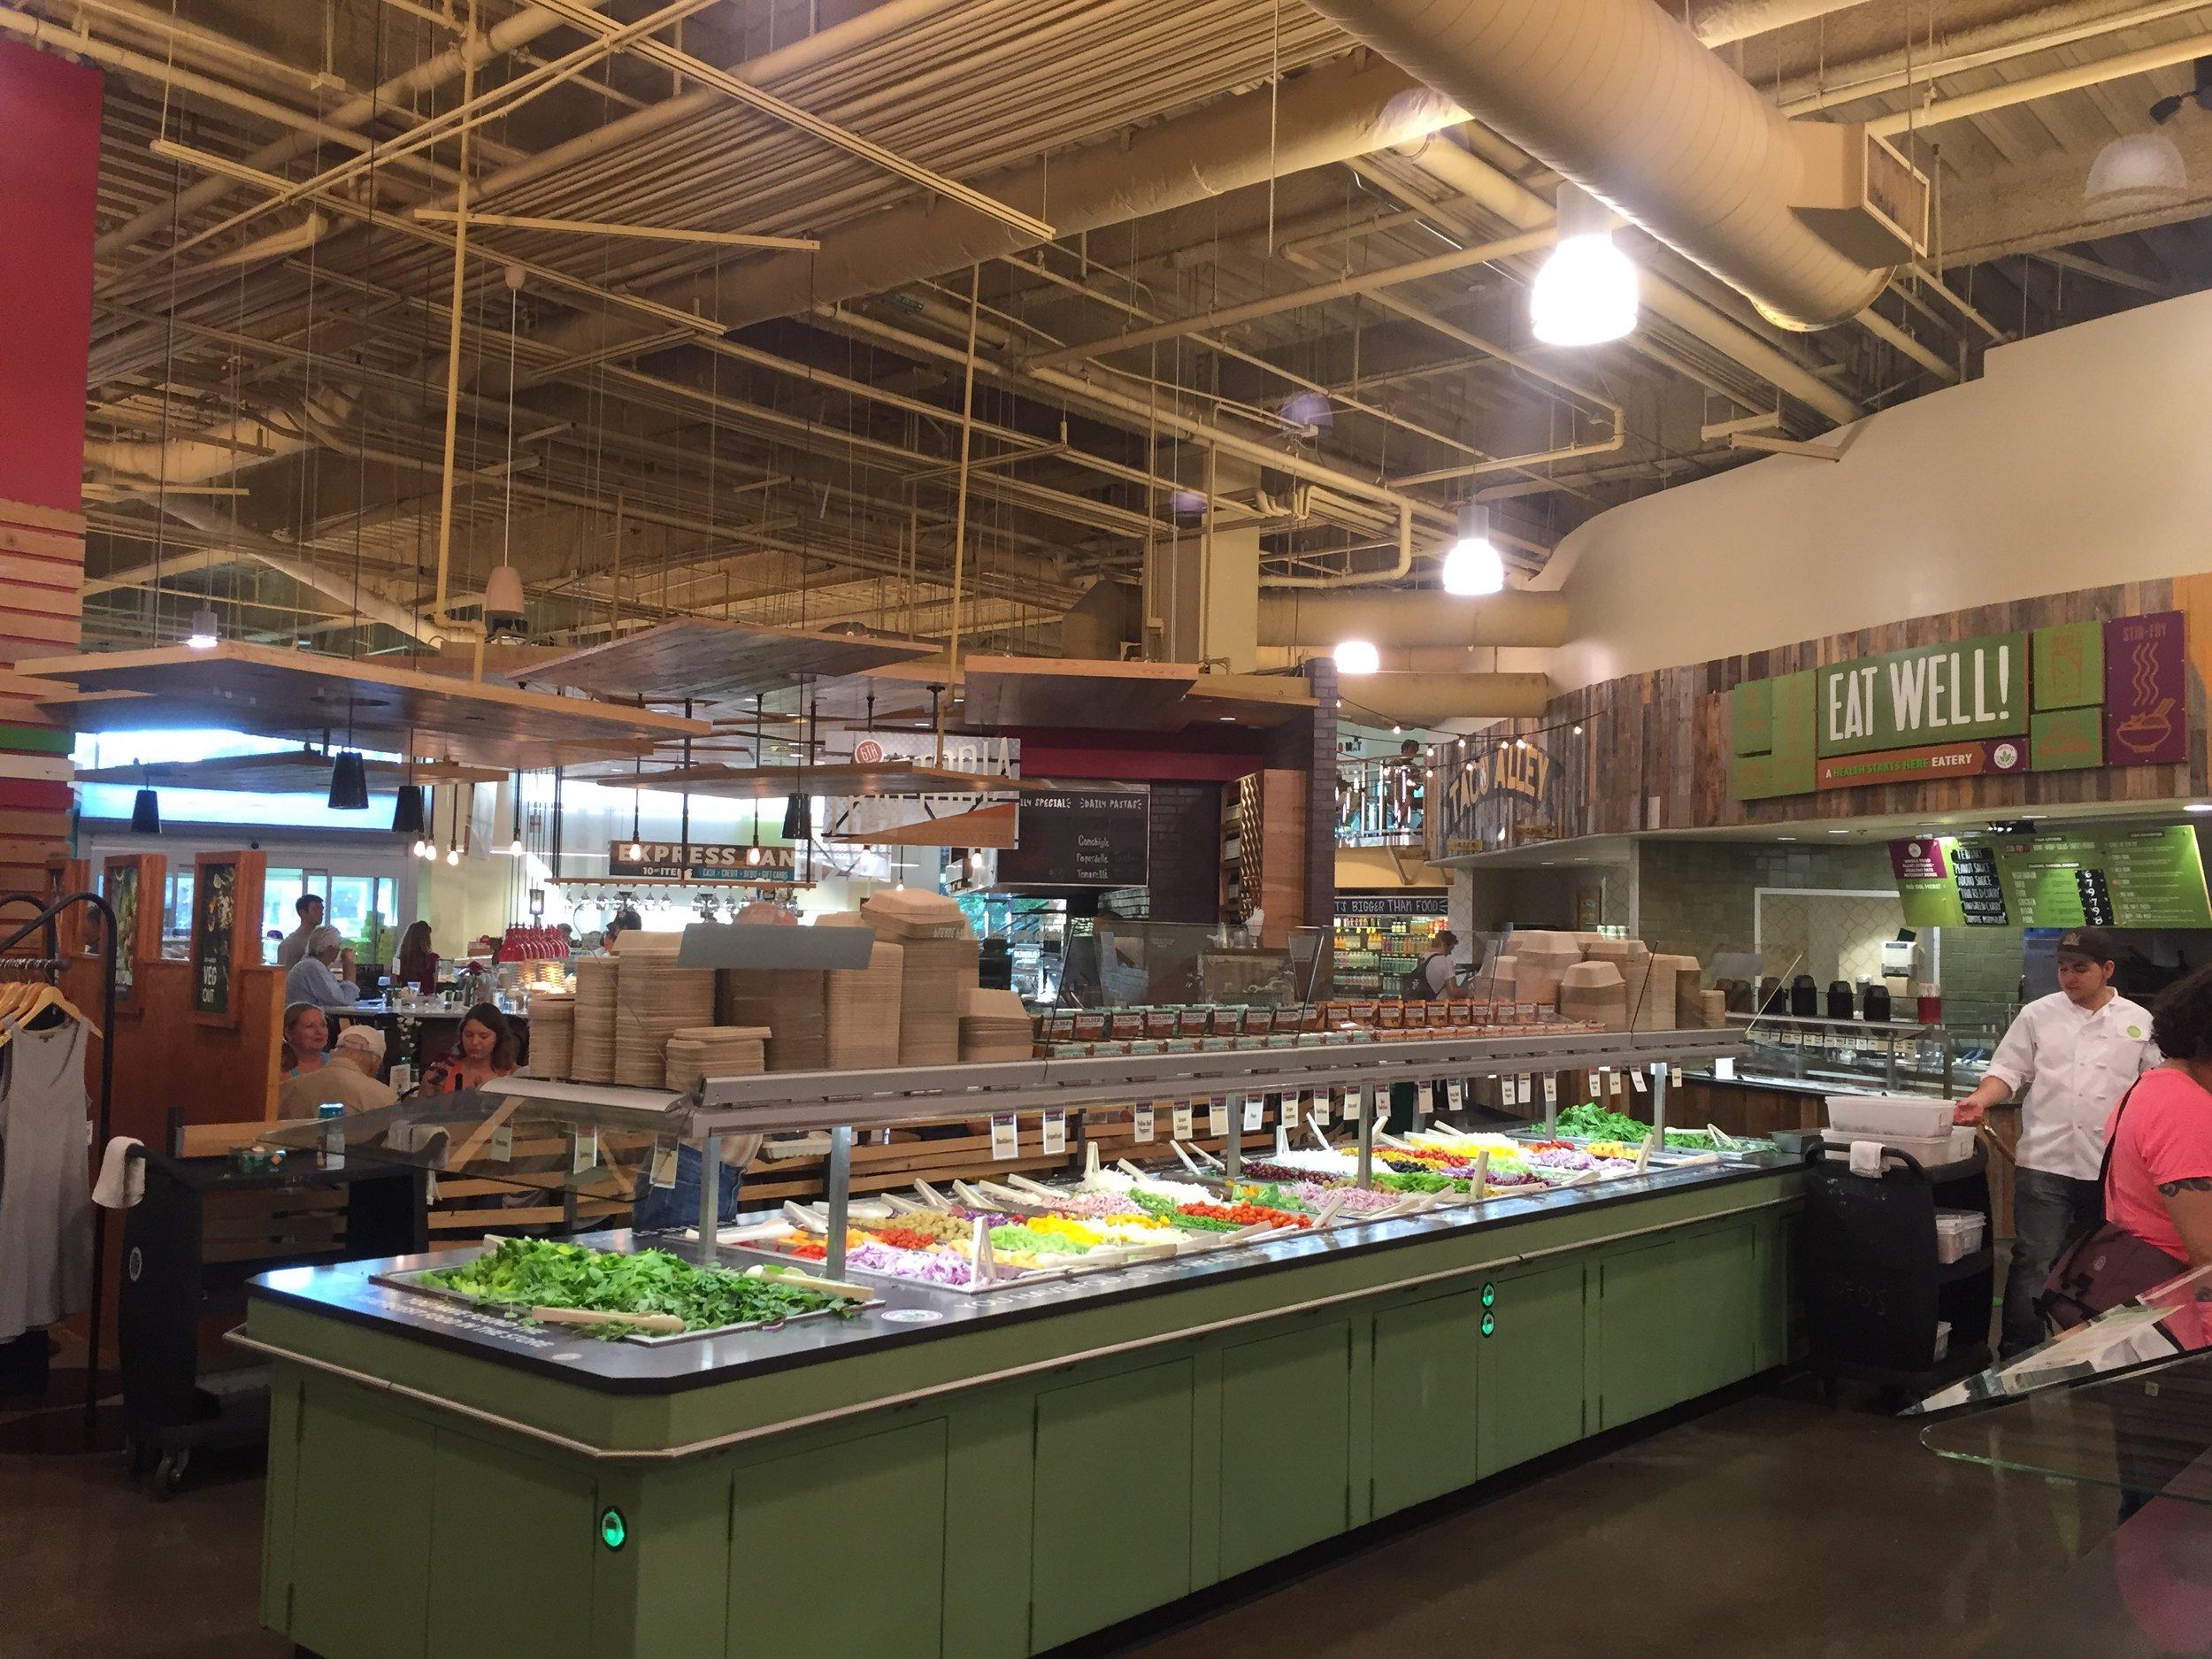 Salad bar inside Whole Foods Market in Austin, TX